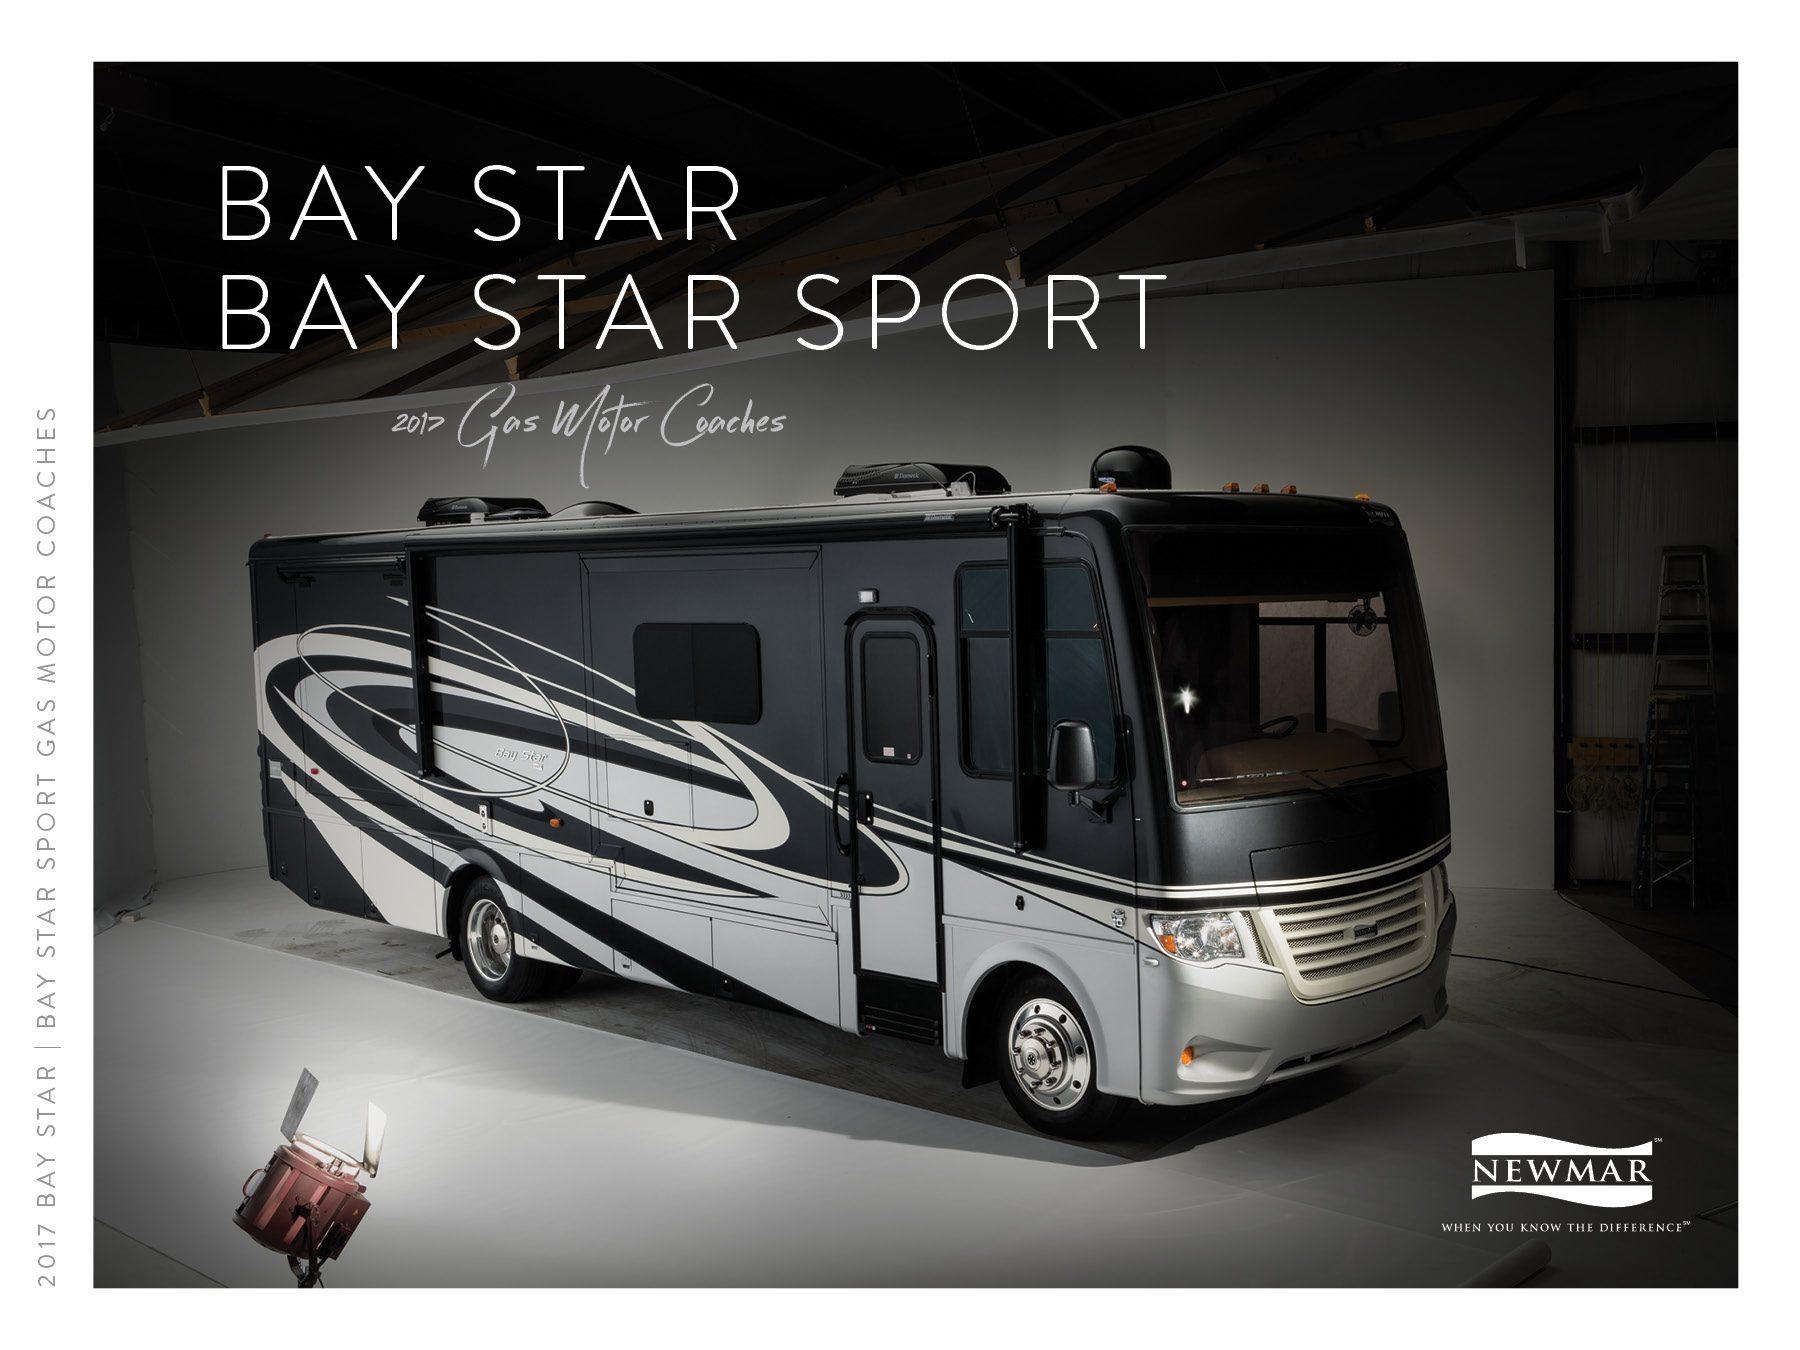 2017 Bay Star, Bay Star Sport